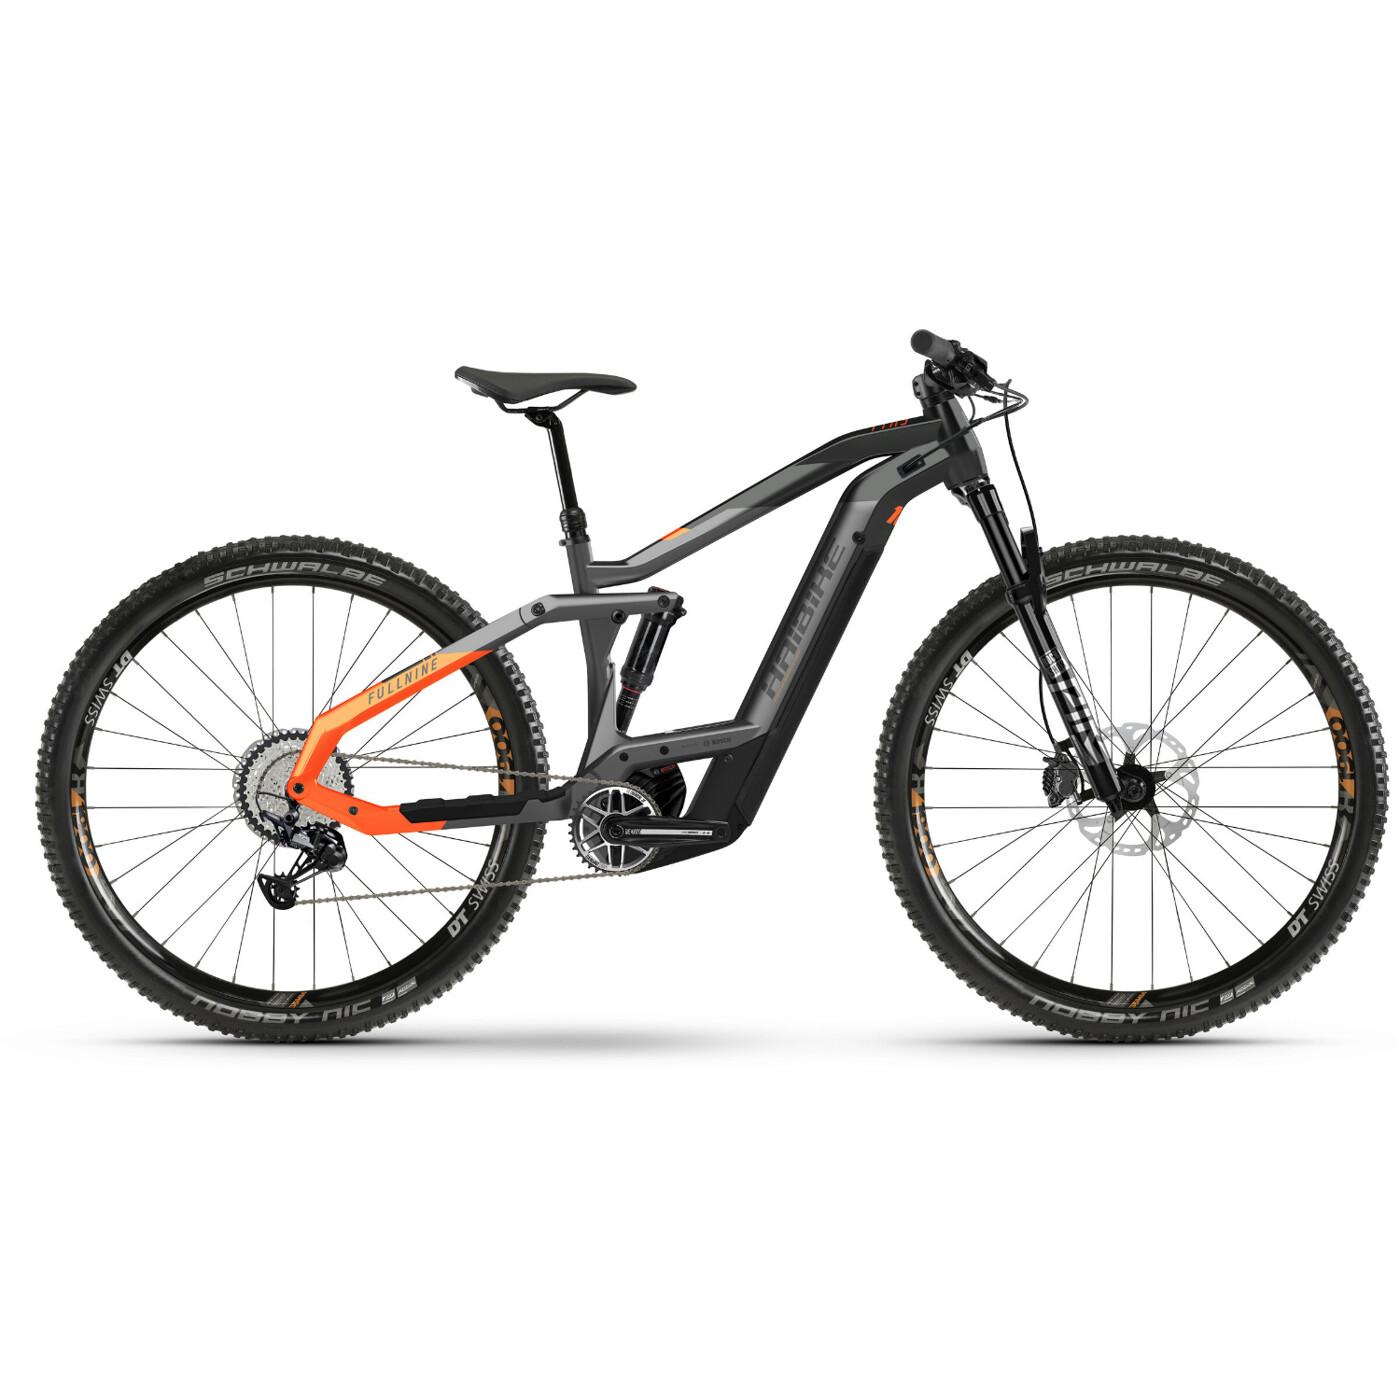 E-Bike FullNine 10 625WH 12-G XT Bosch Haibike